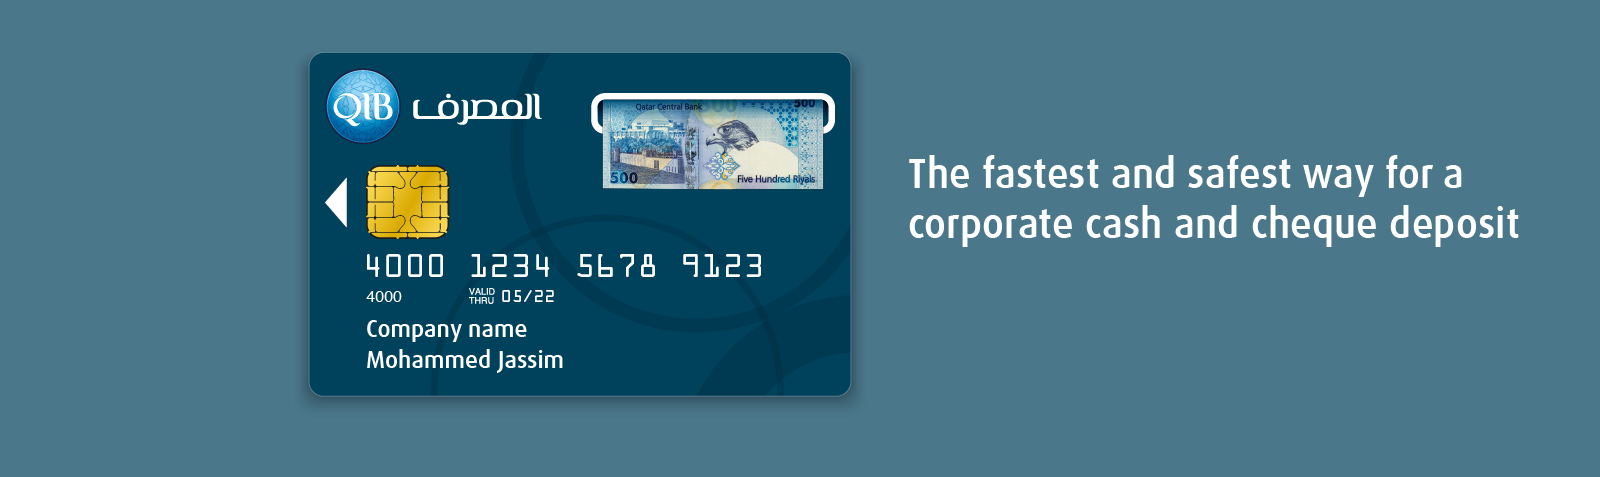 en- corporate card